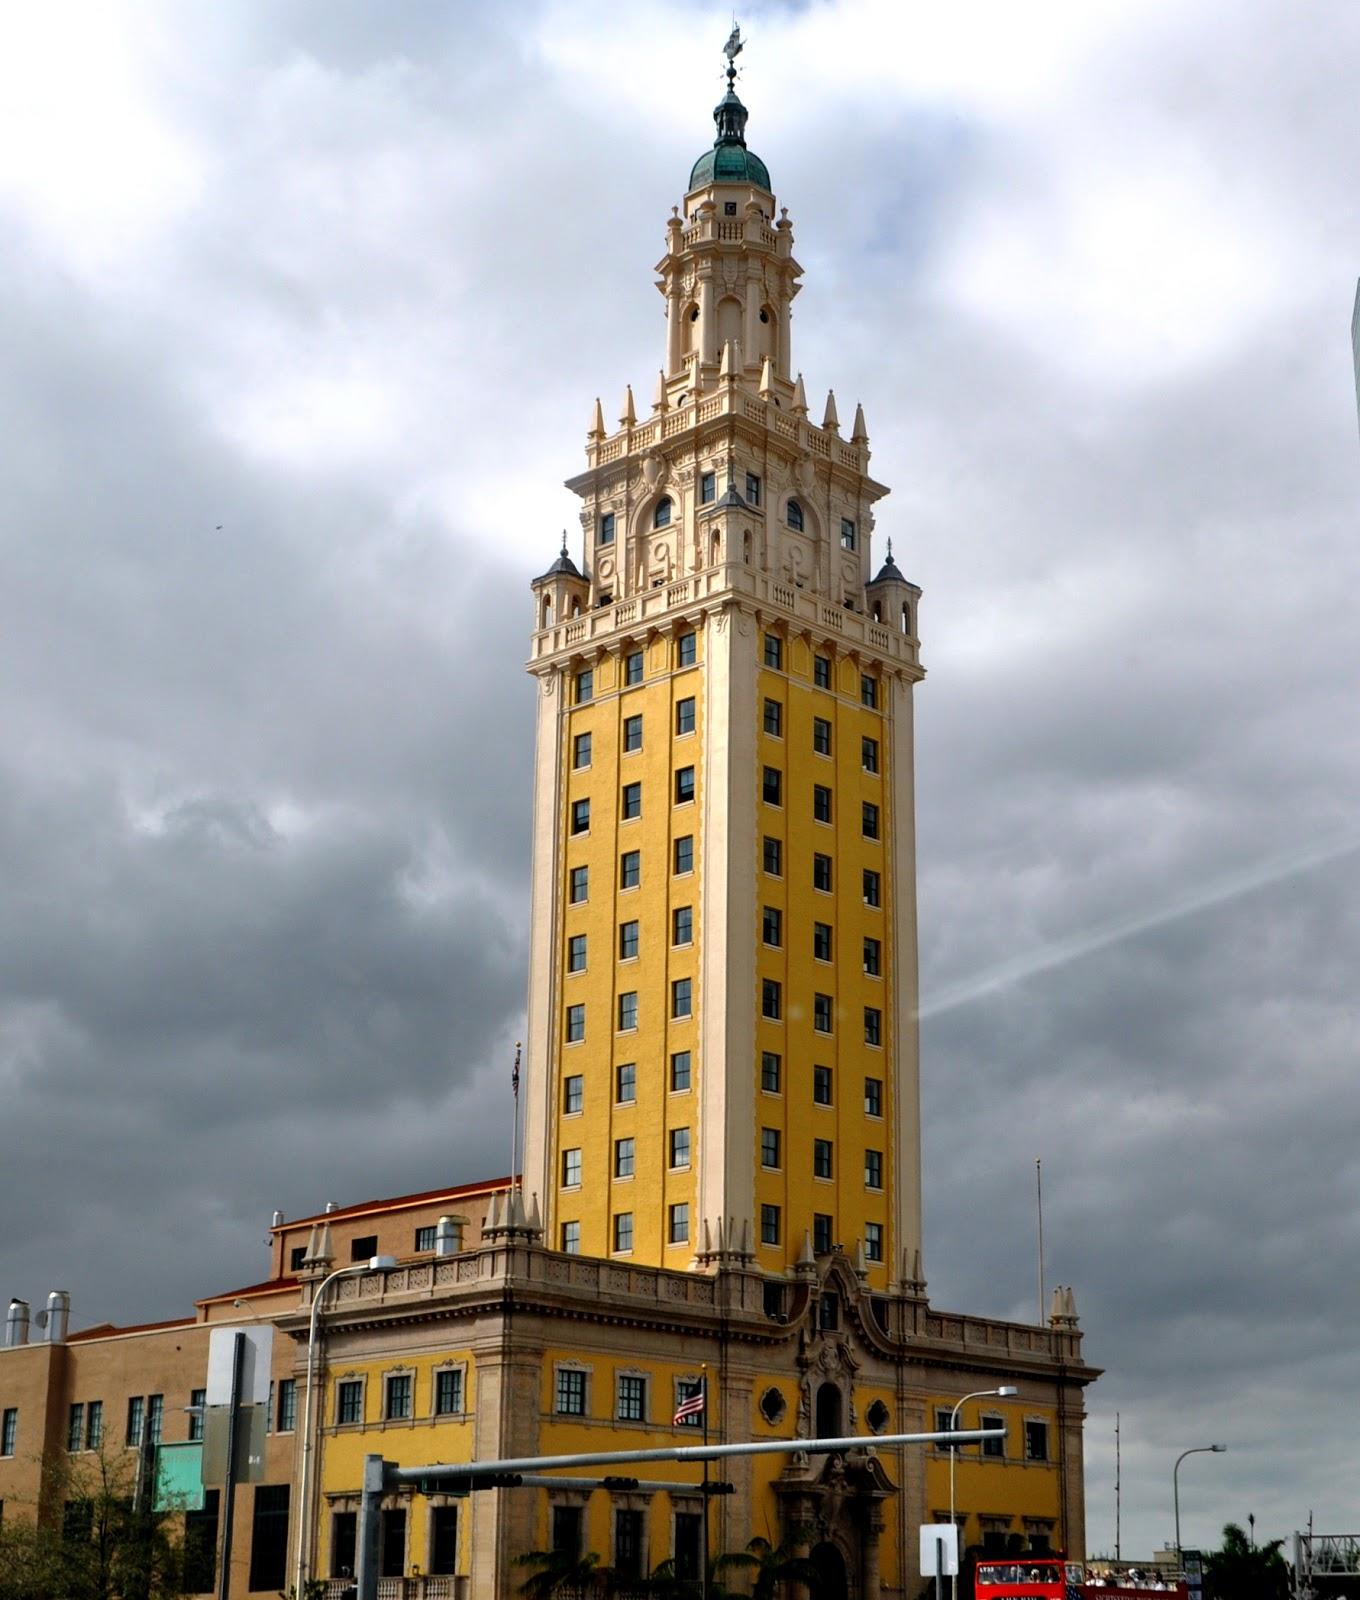 http://3.bp.blogspot.com/-kzpBQsIrmHs/T0D2XlYXCFI/AAAAAAAAC6I/dbMo0_FhsC0/s1600/freedom+tower3.jpg